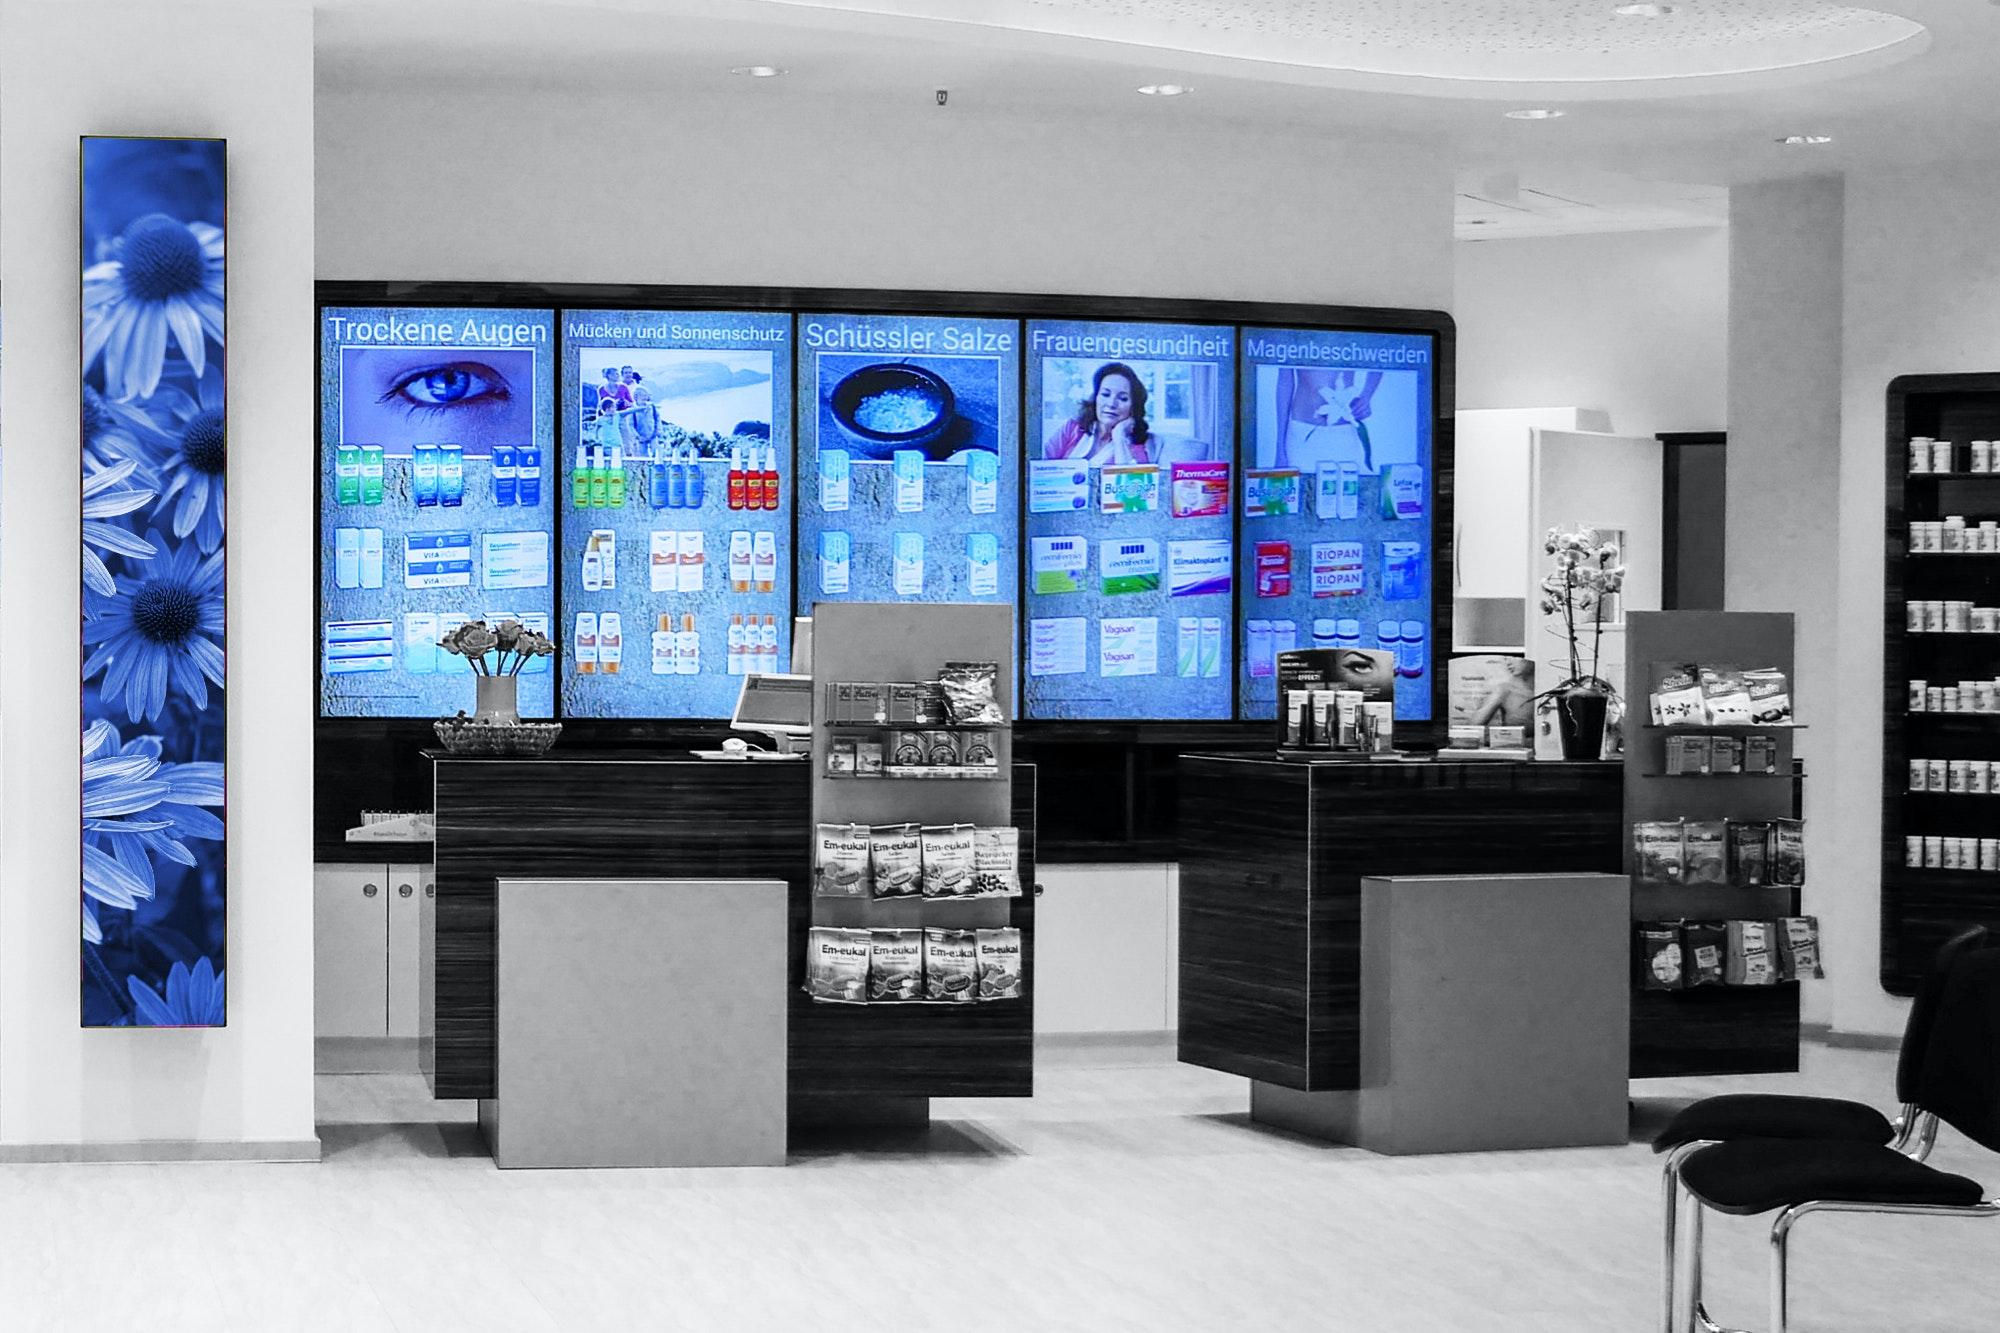 Apostore Digitale Loesungen Screens apotheke panorama wall Produkte Sichwahl EDIT BR